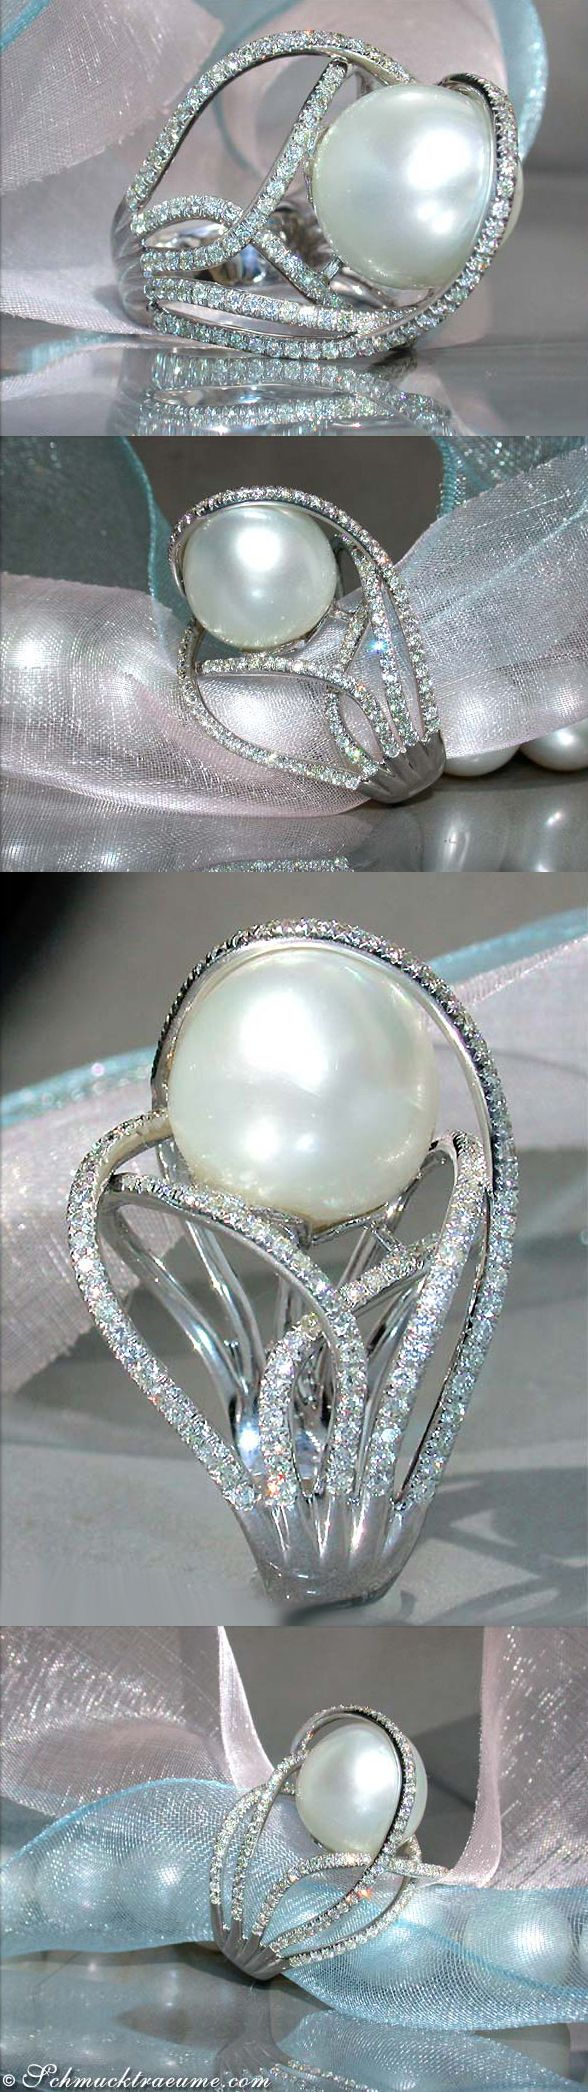 best 25 pearl ideas on